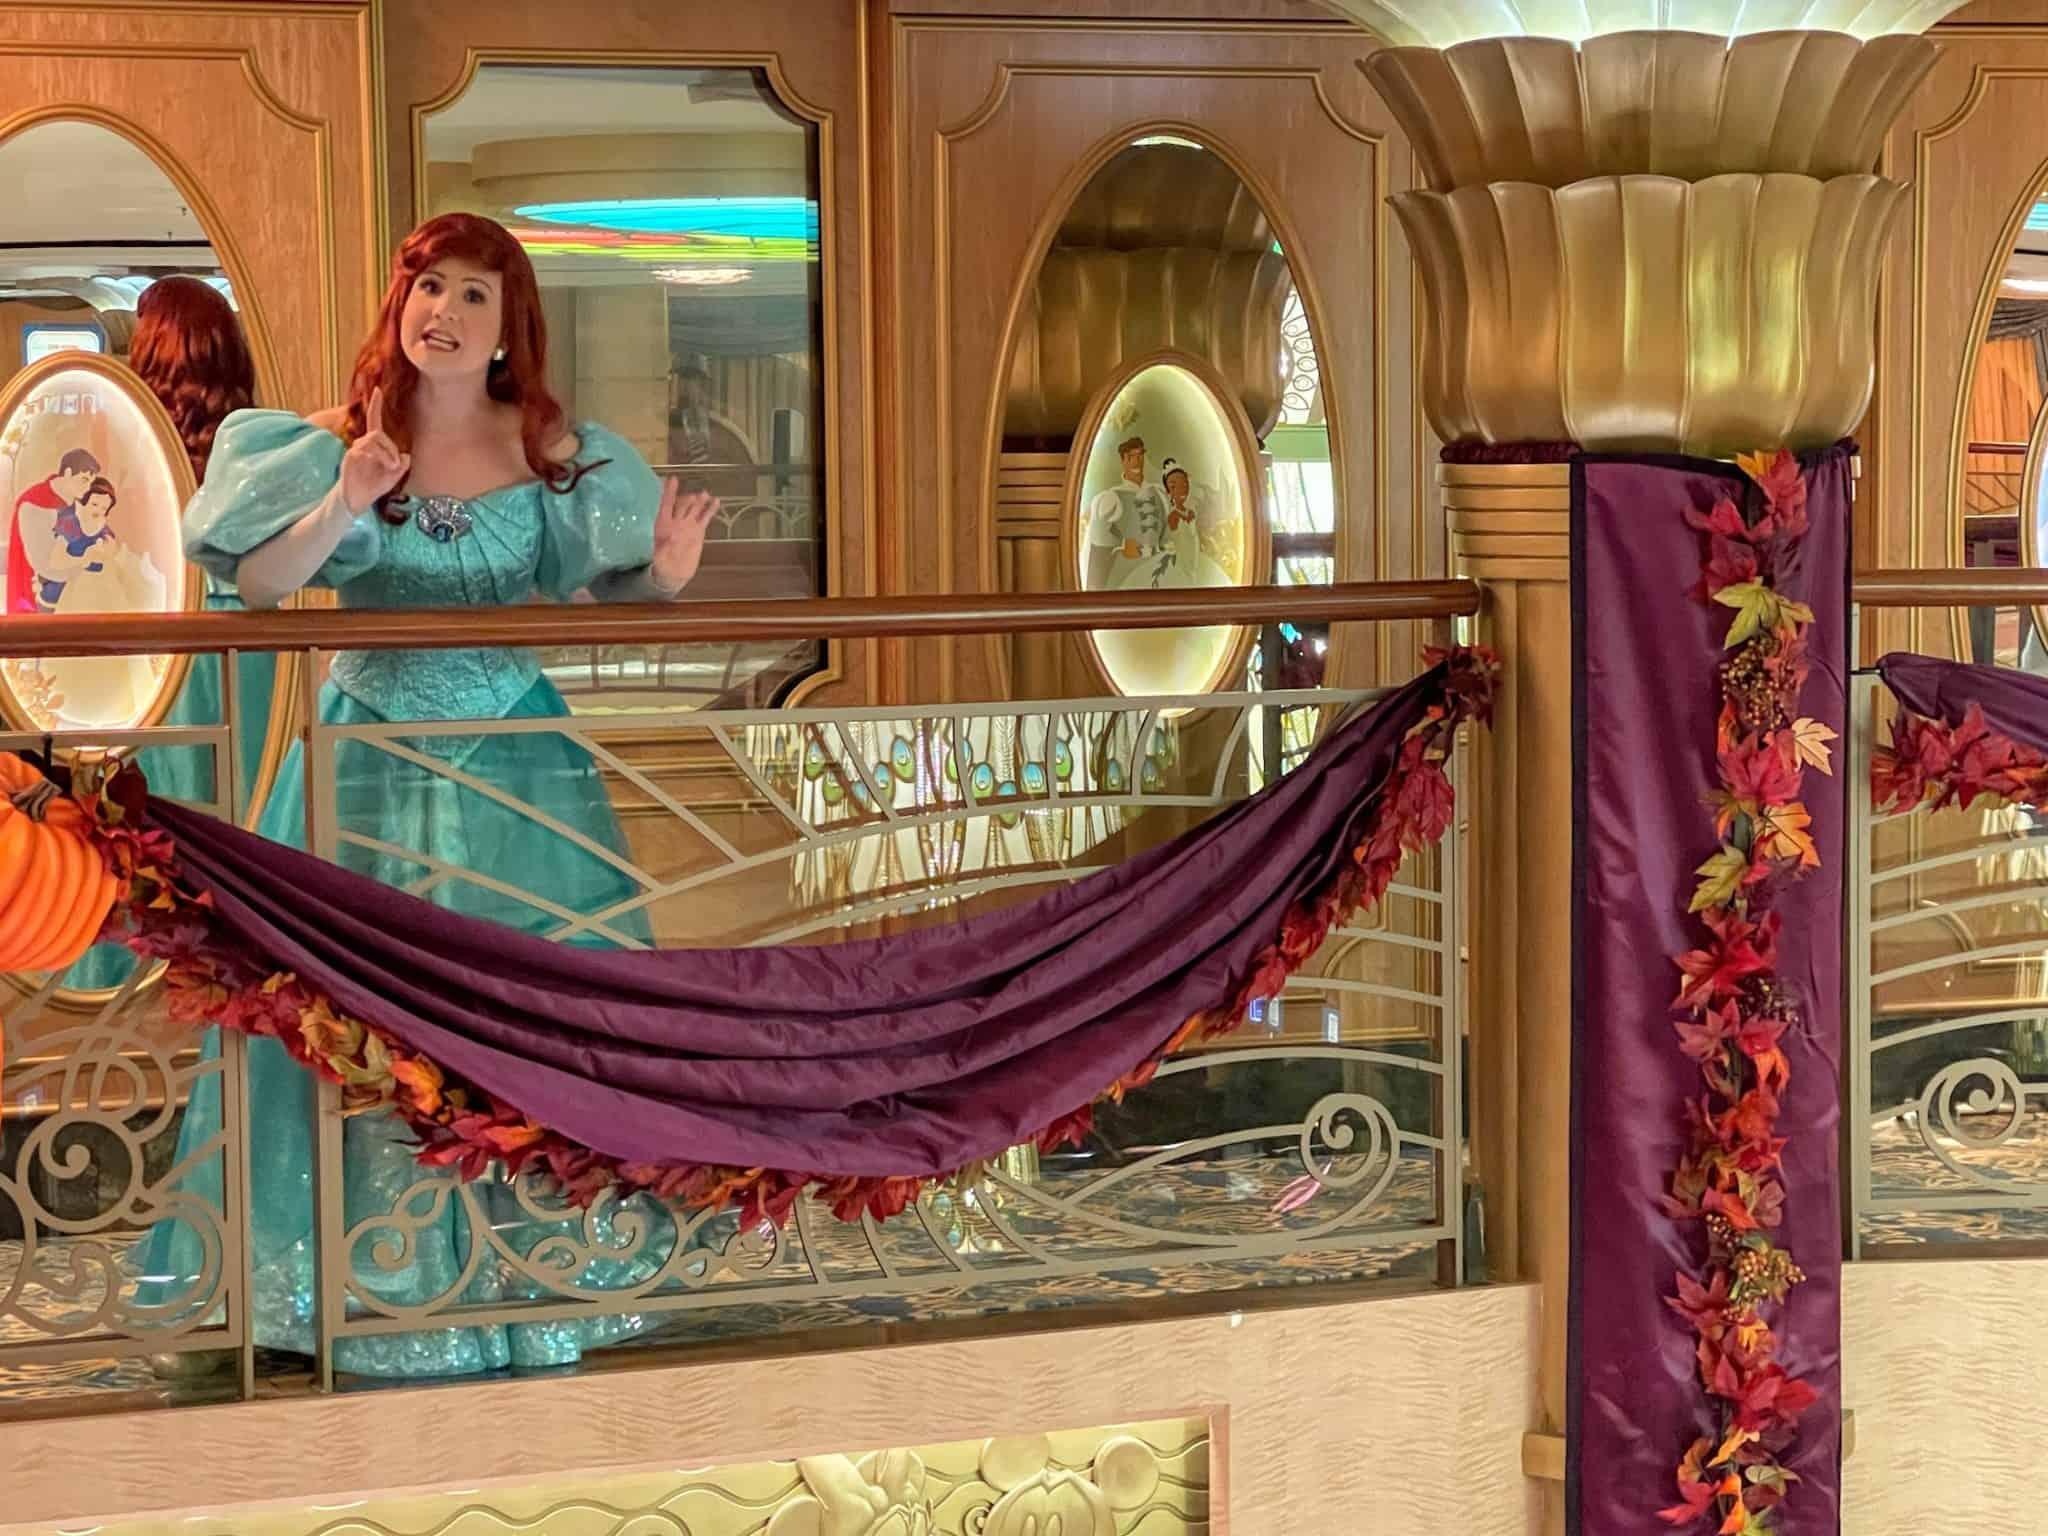 ariel little mermaid disney fantasy